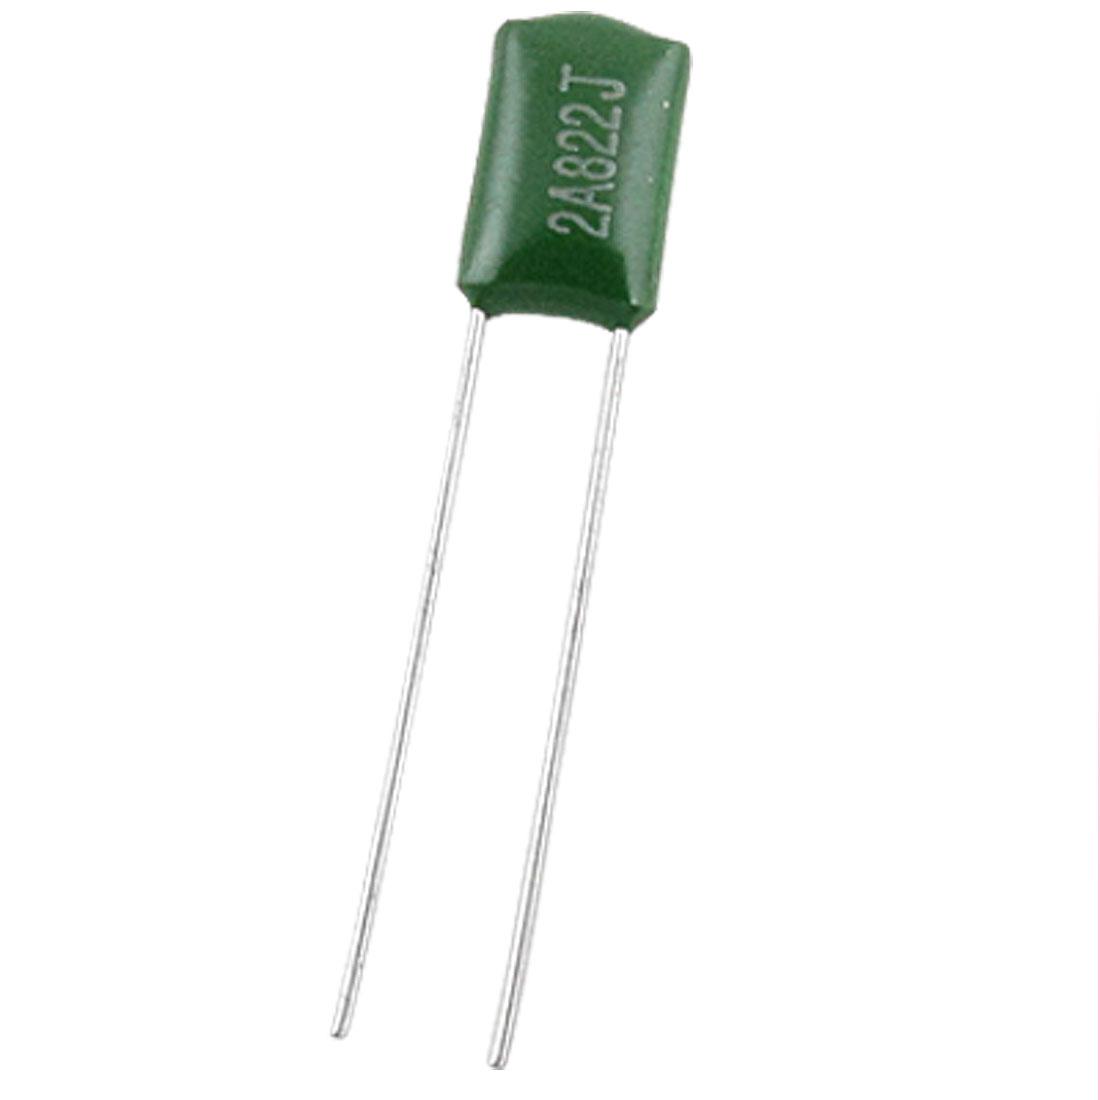 50 Pcs 0.0082uF 8200pF 100V Non Polar DIP Polyester Film Capacitors